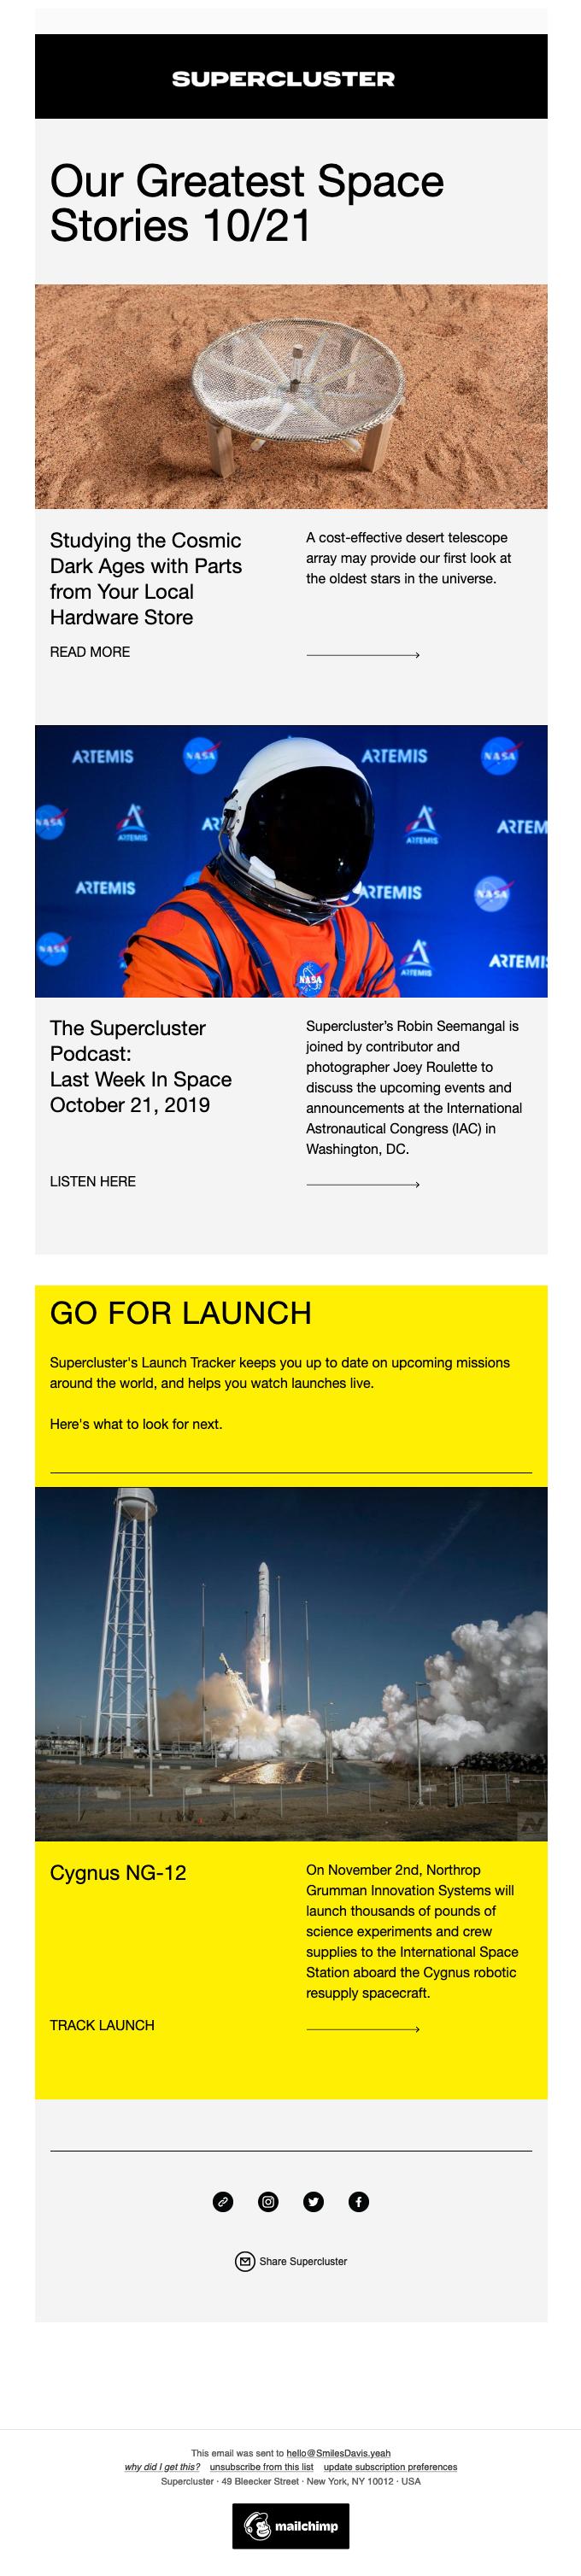 The Supercluster Newsletter 10.21.19